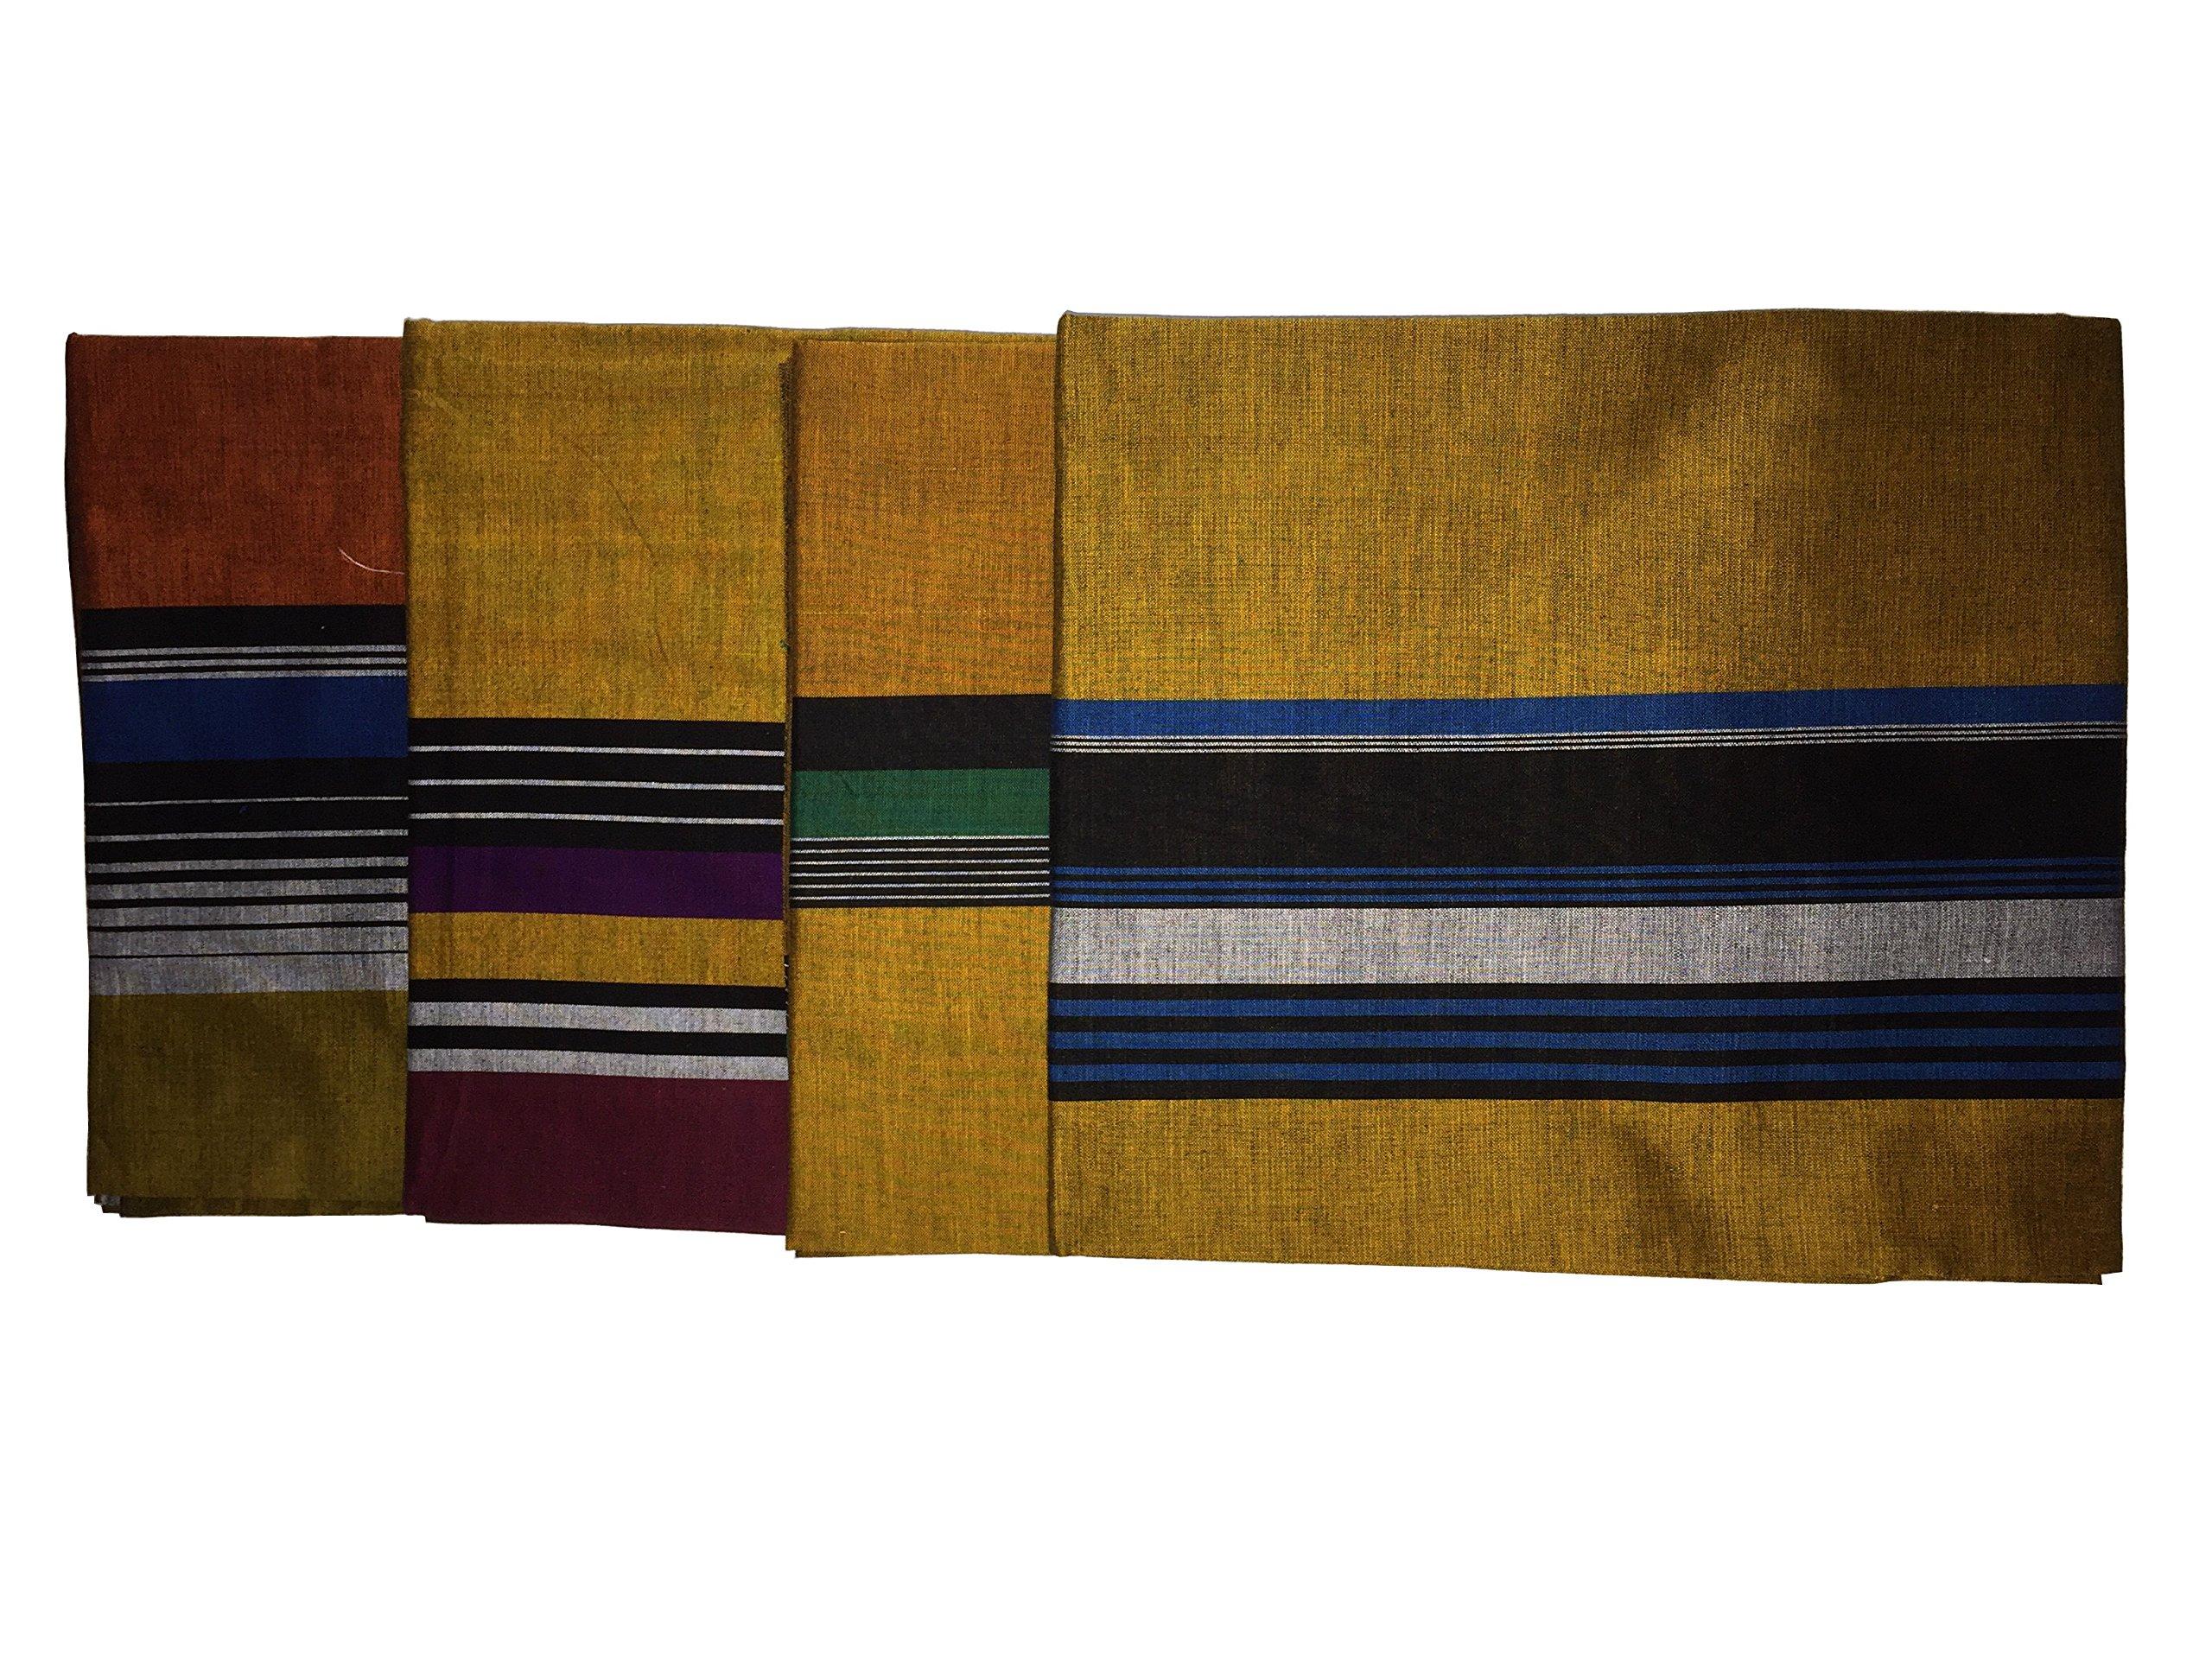 ReenaHANDS Lungi Sarong Mens Handloom Lungi Sarong 100% Cotton. Stitched Tube Sarong. Assorted Color/Design by ReenaHANDS (Image #4)